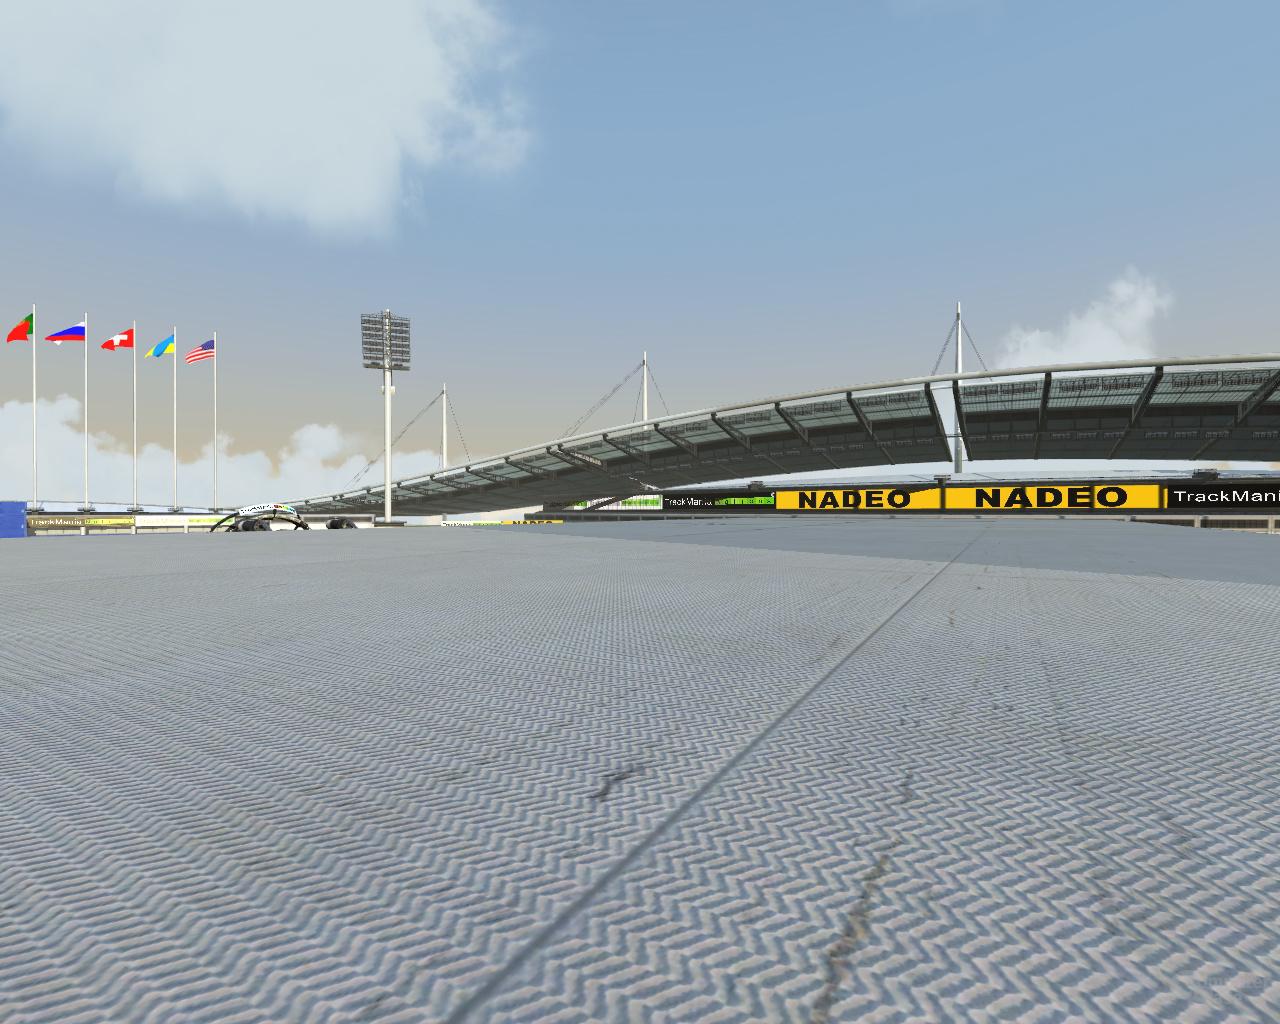 Nvidia GF100 Trackmania - 16xAF